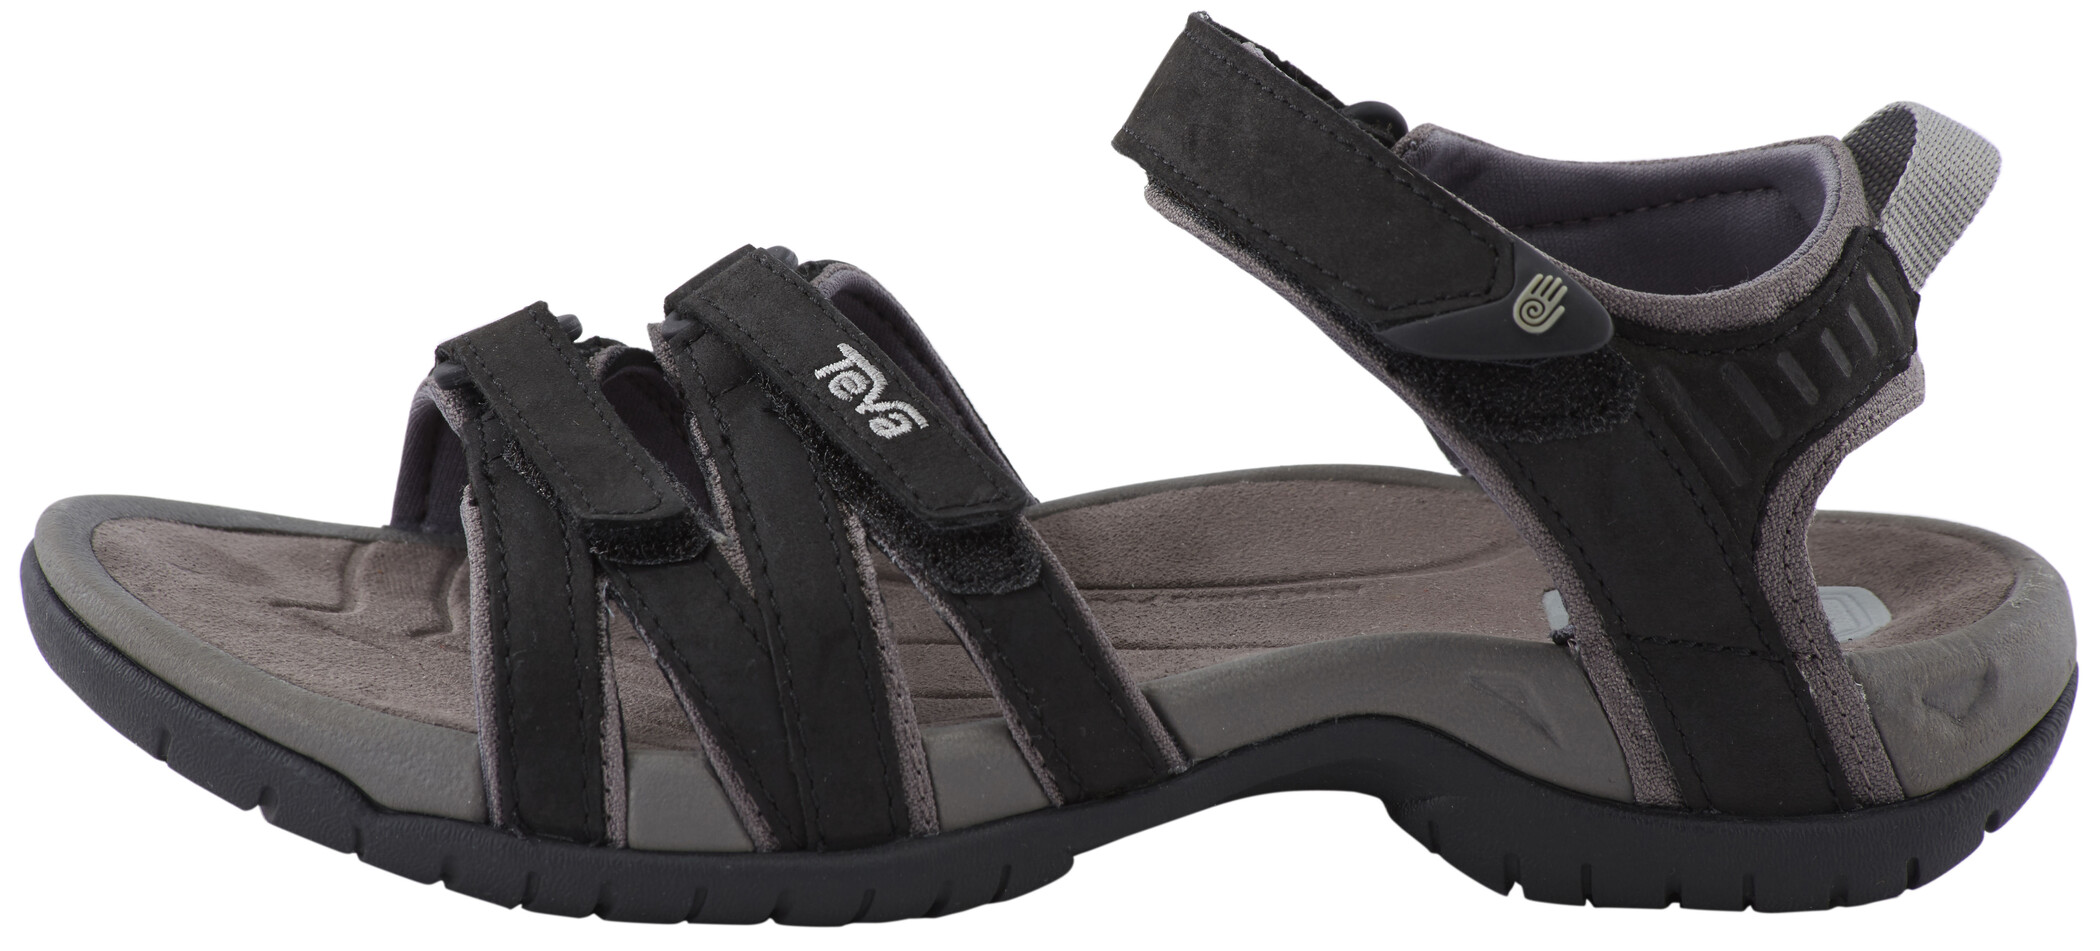 Teva Tirra Leather Sandals Dam black